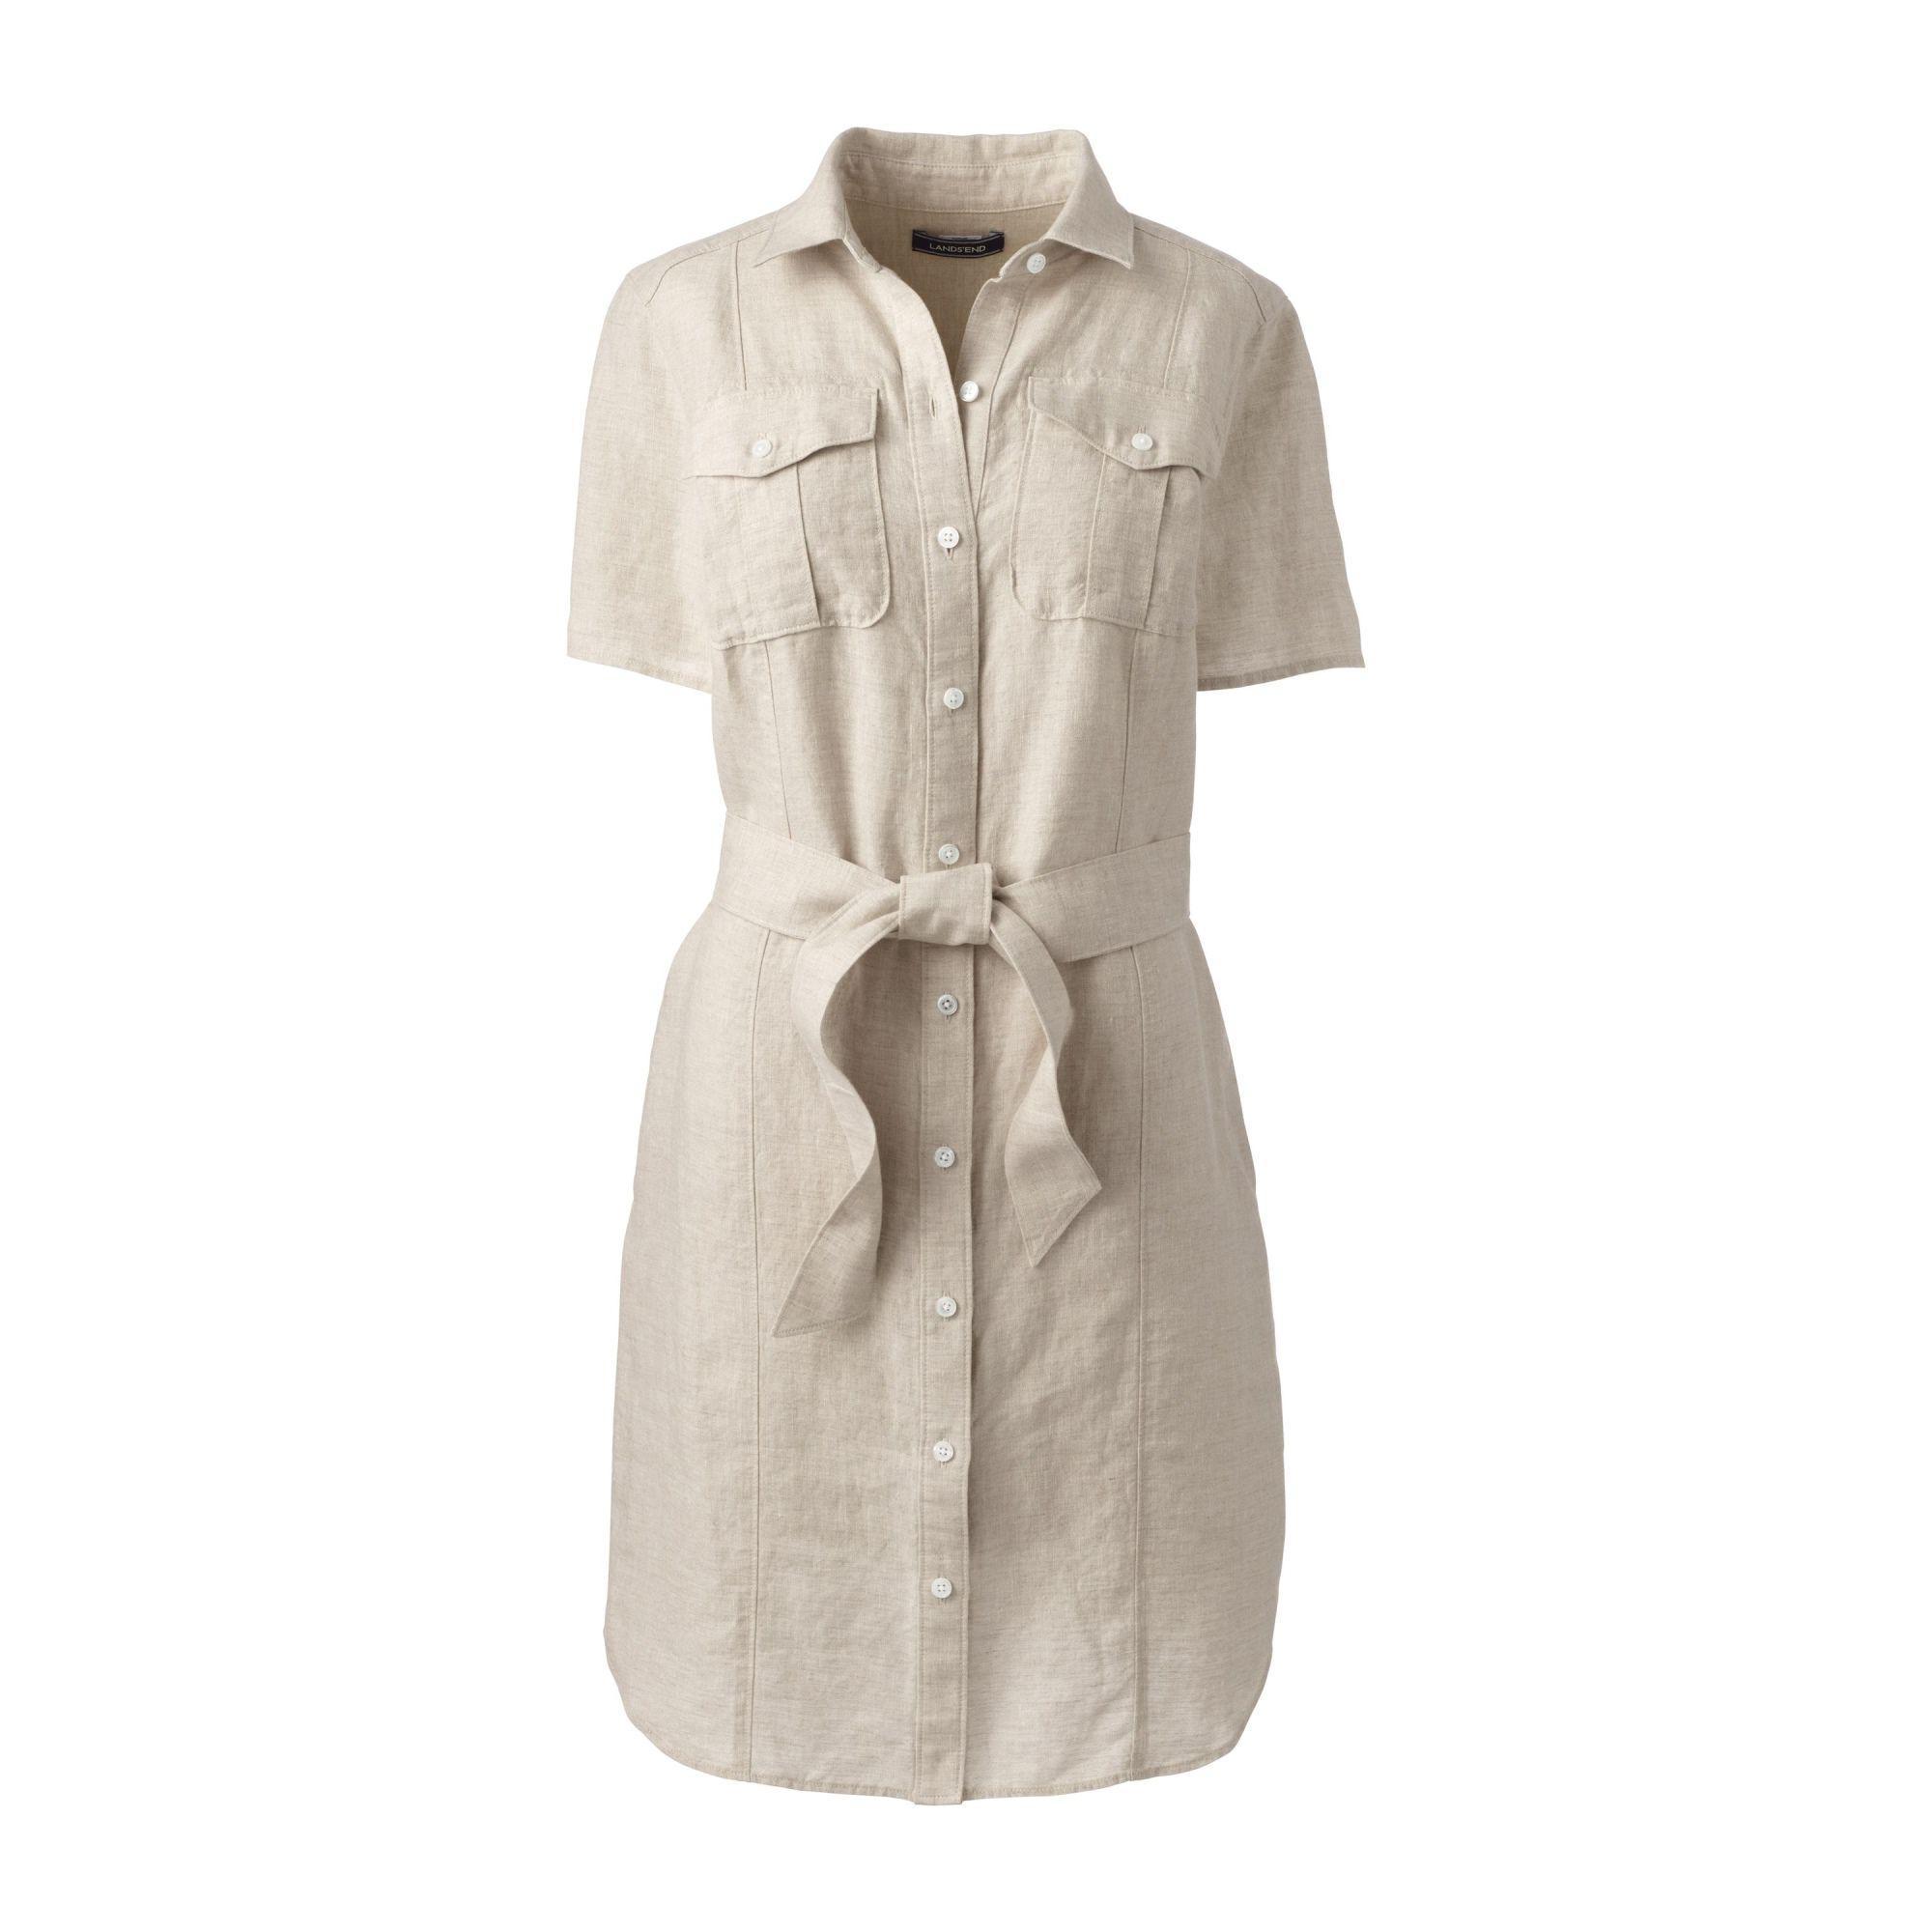 3f6a80c6125 Lands  End Beige Womens Utility Linen Shirt Dress in Natural - Lyst